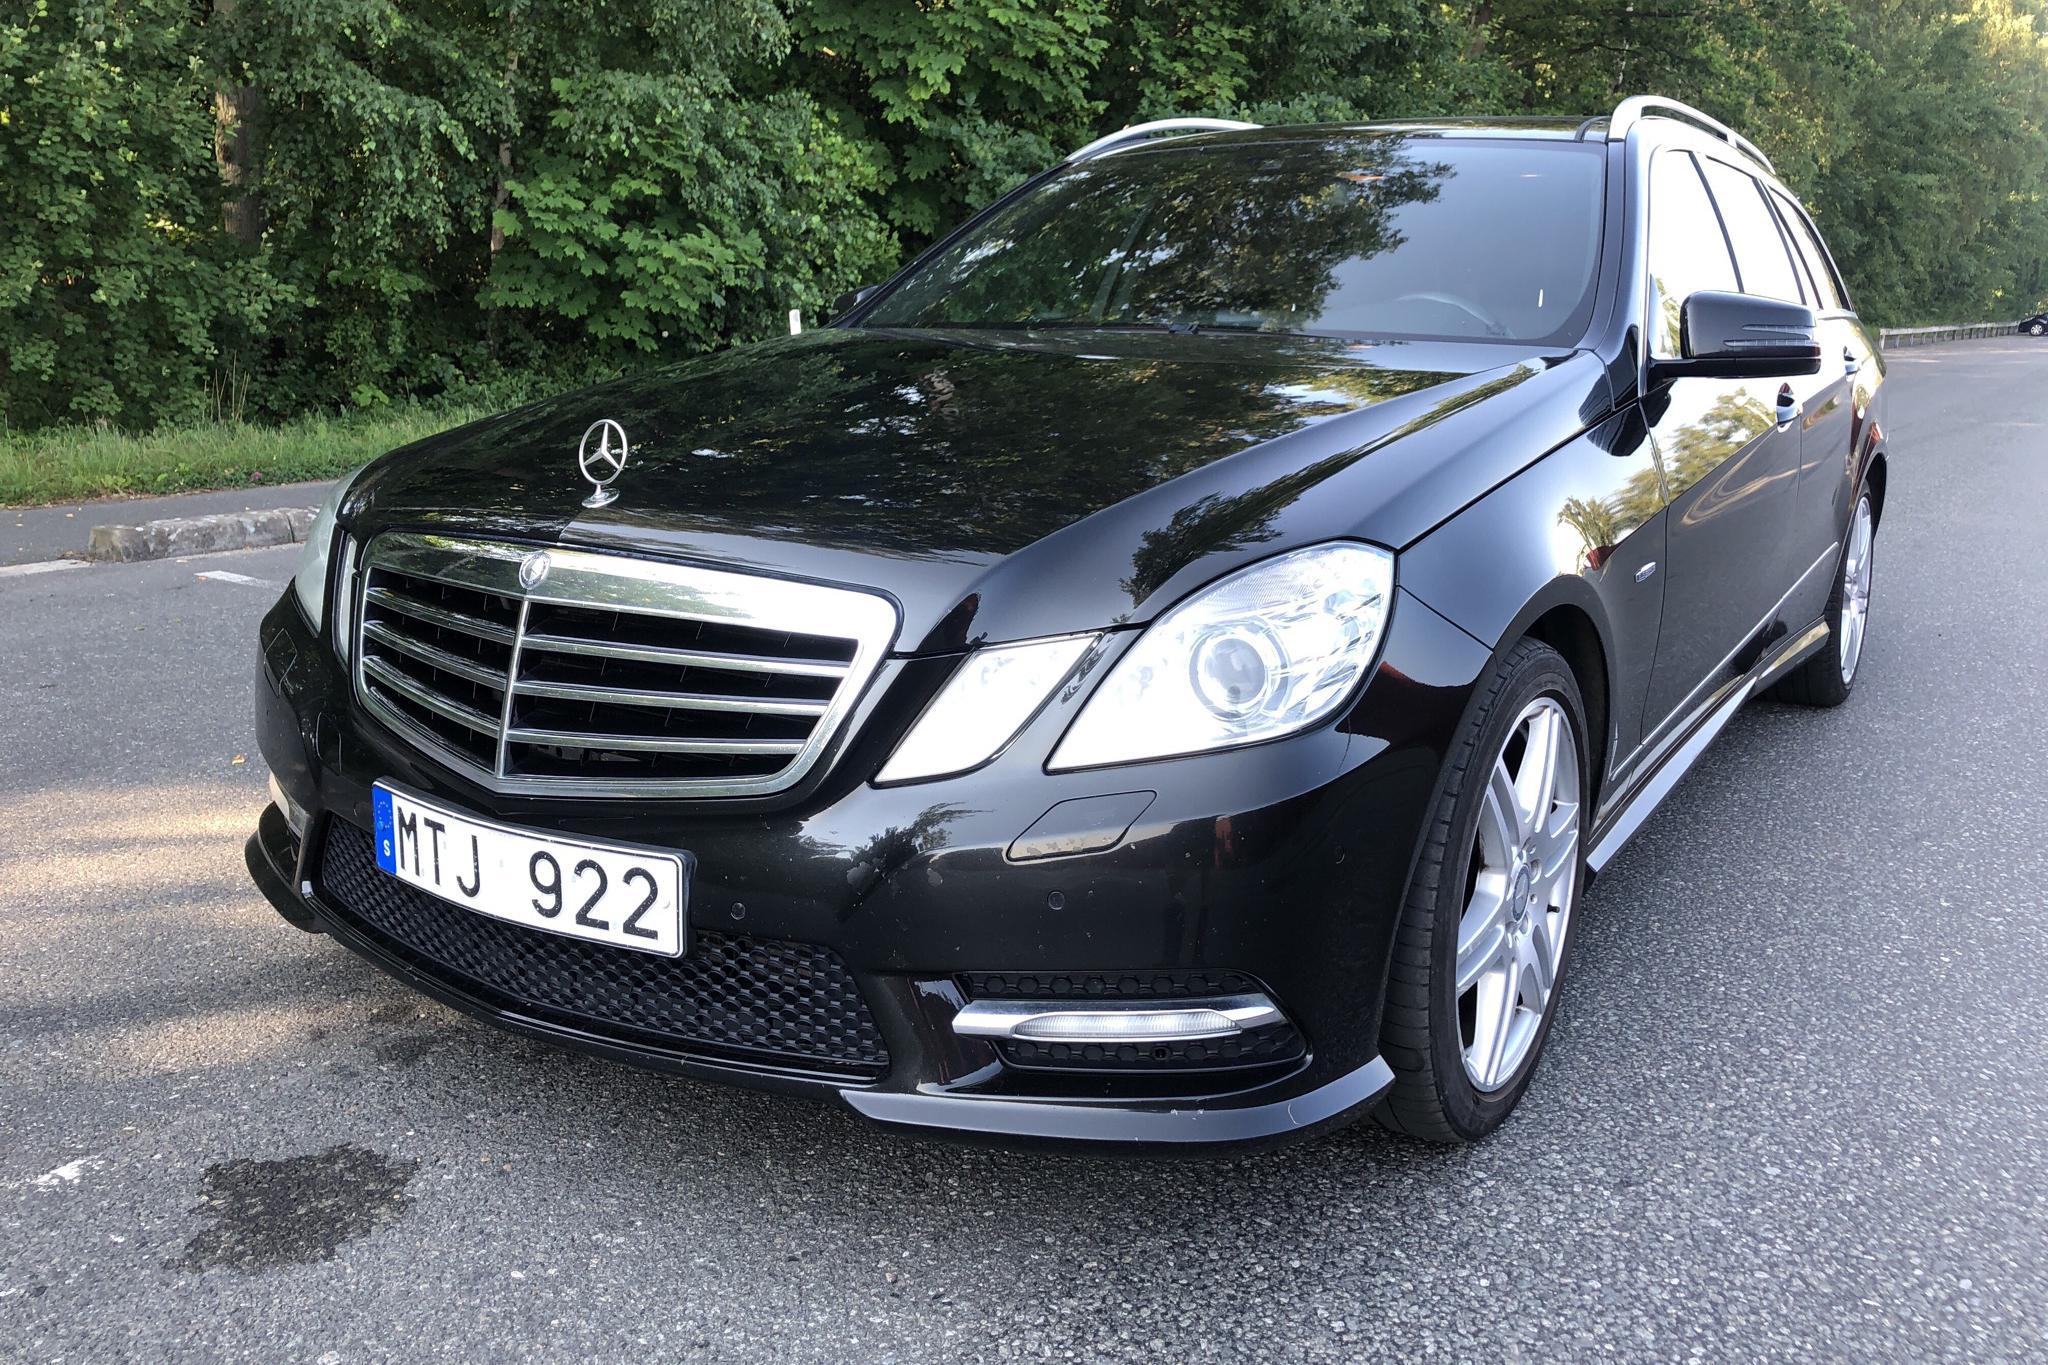 Mercedes E 220 CDI Kombi S212 (170hk) - 182 770 km - Automatic - black - 2012